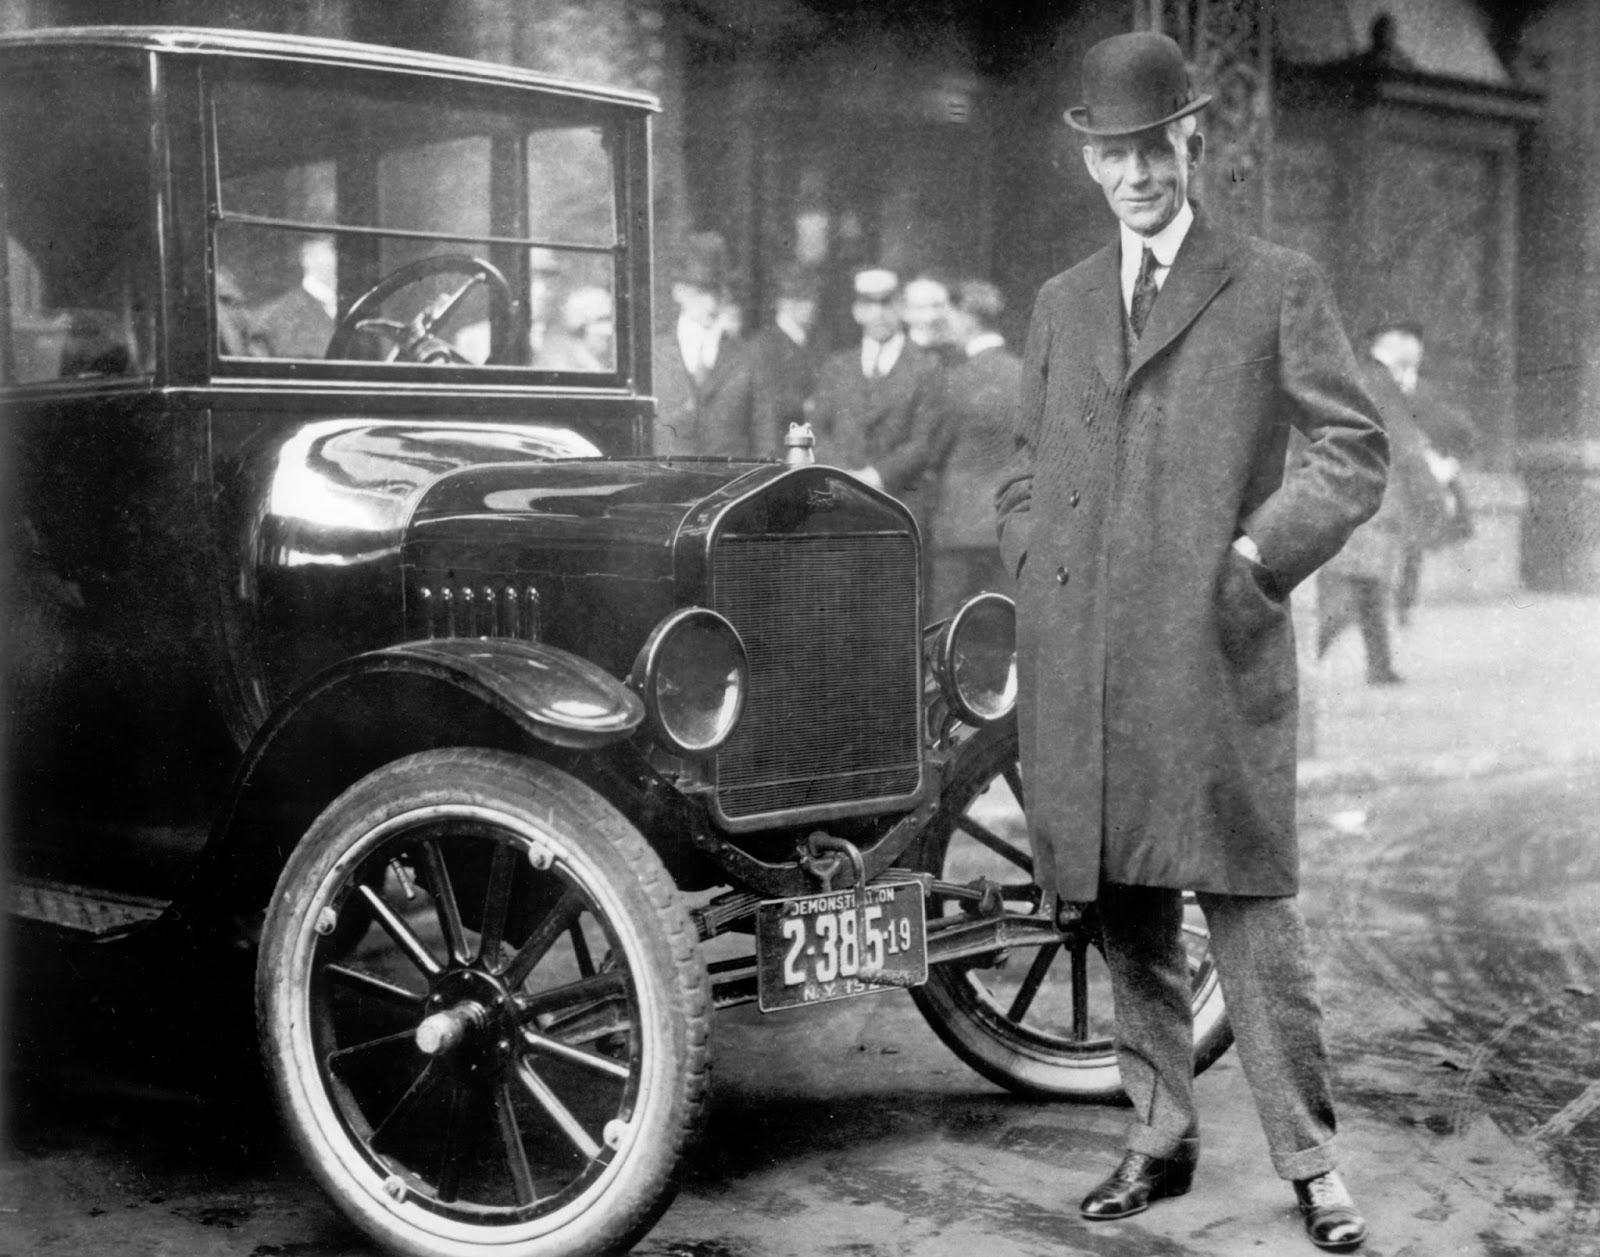 O%2Bhenry%2Bford Όταν ο Henry Ford, έφτιαξε το πρώτο του μοτέρ, μέσα σε έναν νεροχύτη Ford, Henry Ford, zblog